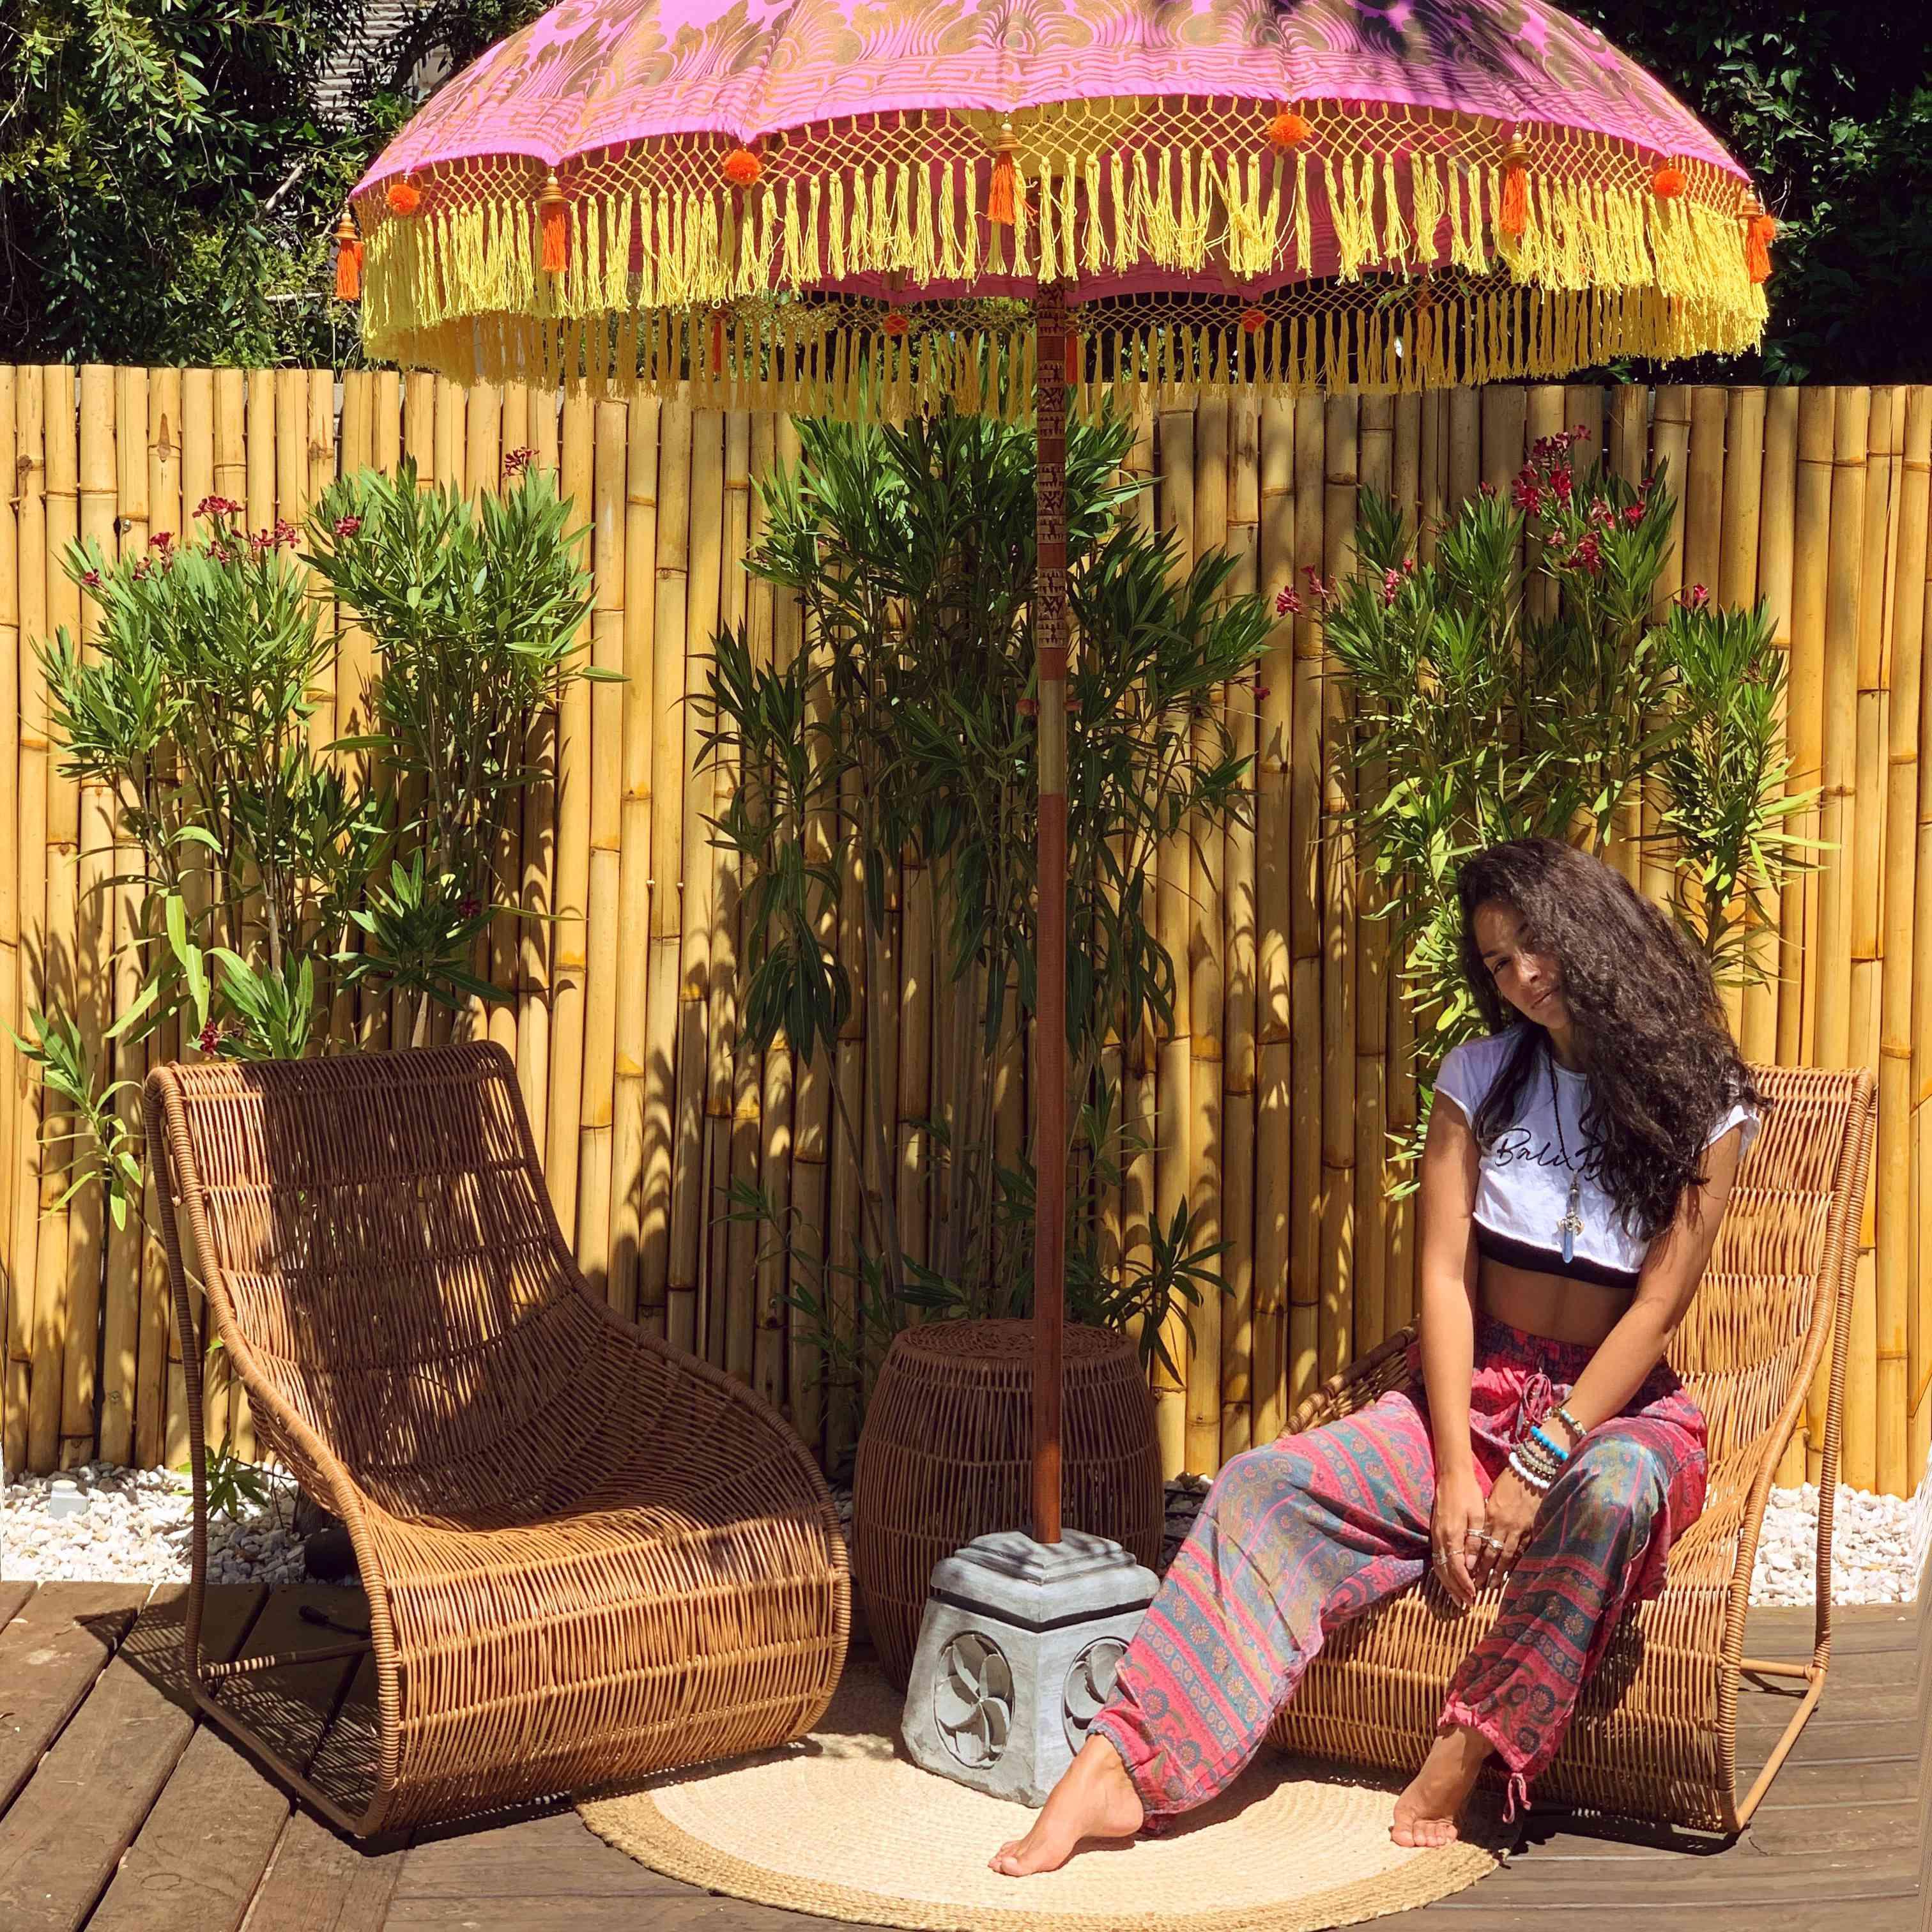 Angelique Velez sitting by her poolside